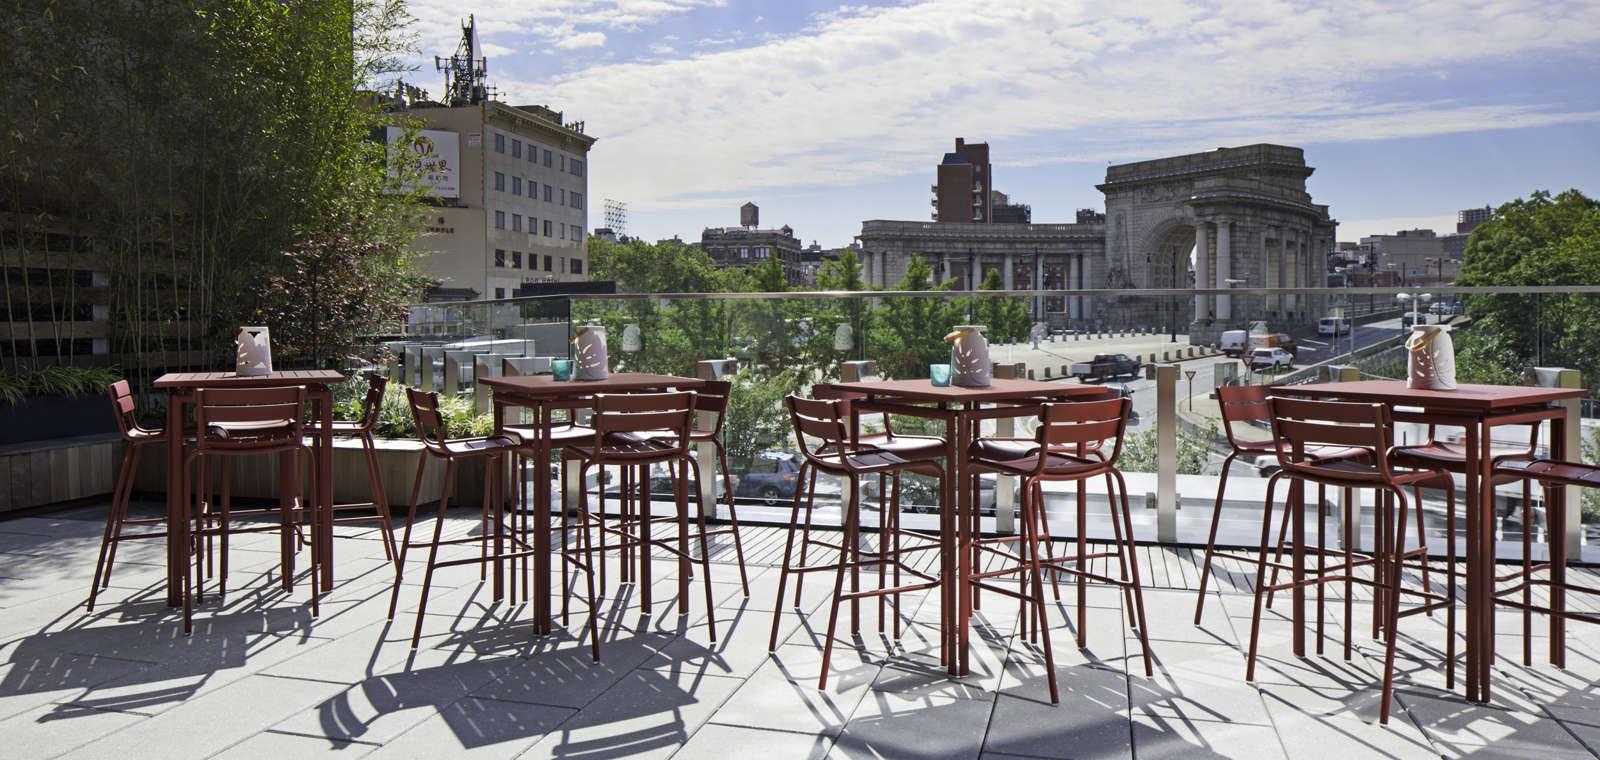 Hotel  50 Bowery 2017 Ivy TSANG